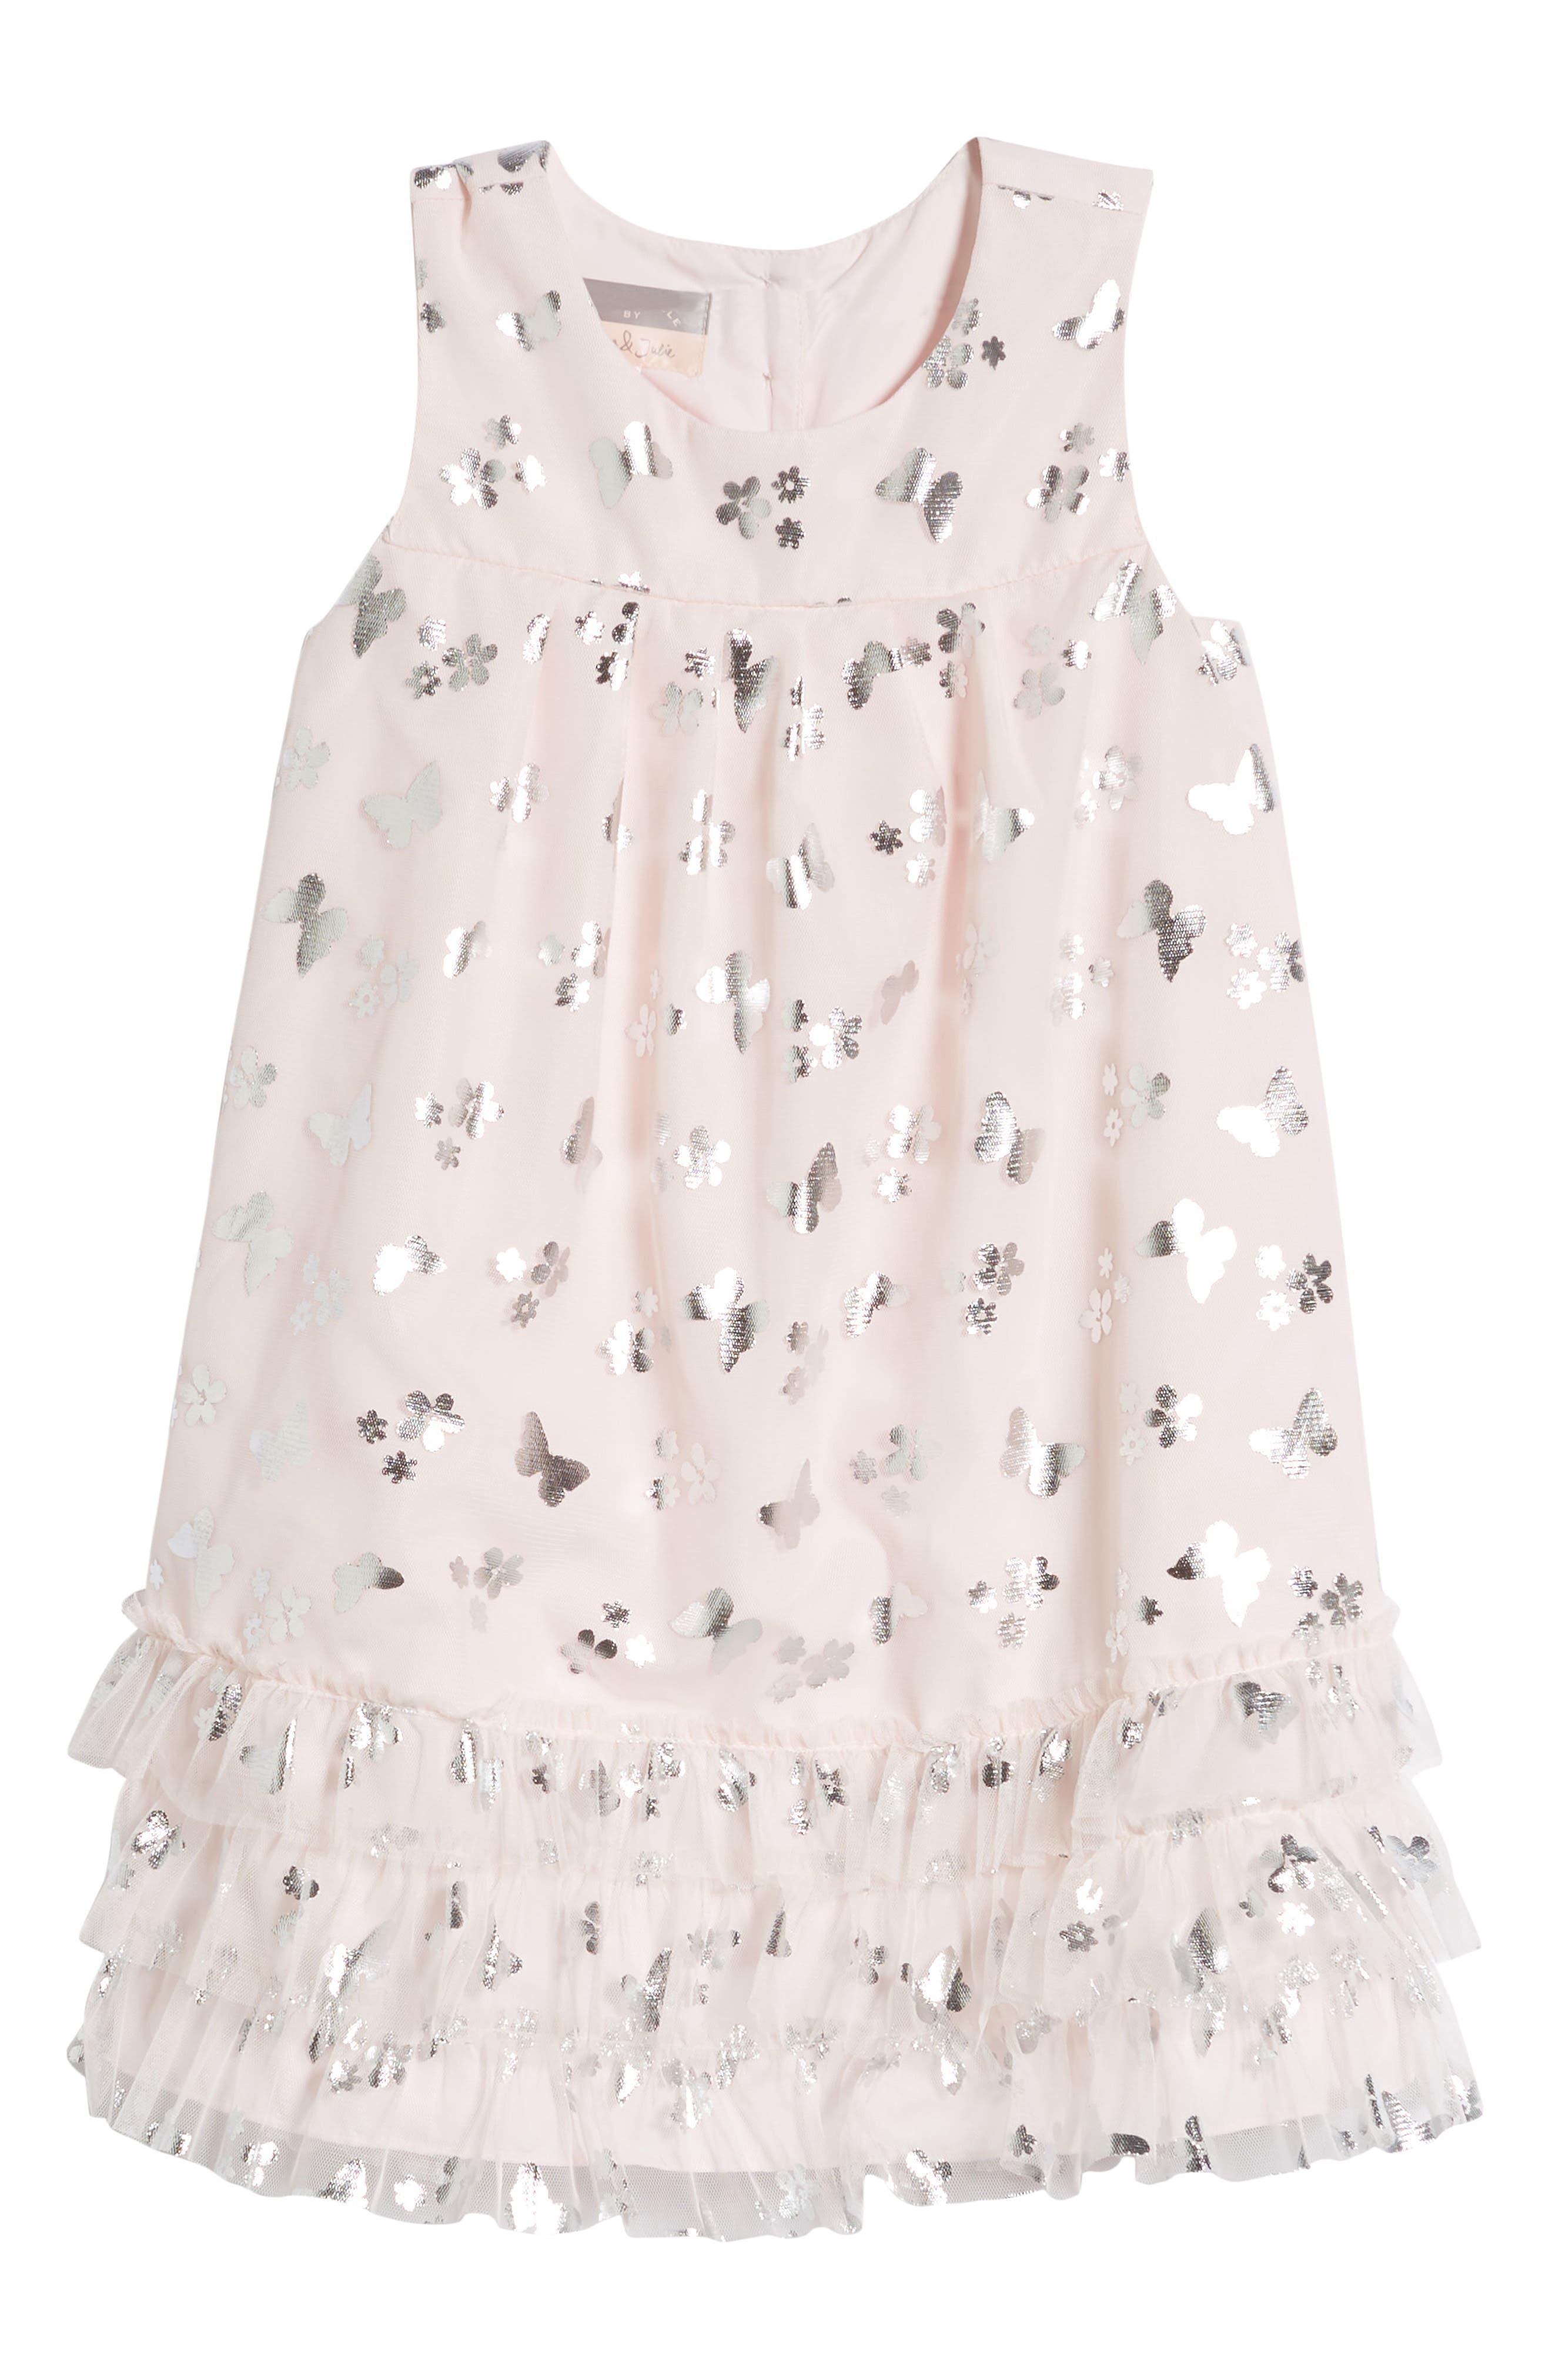 8aa23bae20d Girl s Pastourelle By Pippa   Julie Butterfly Trapeze Dress